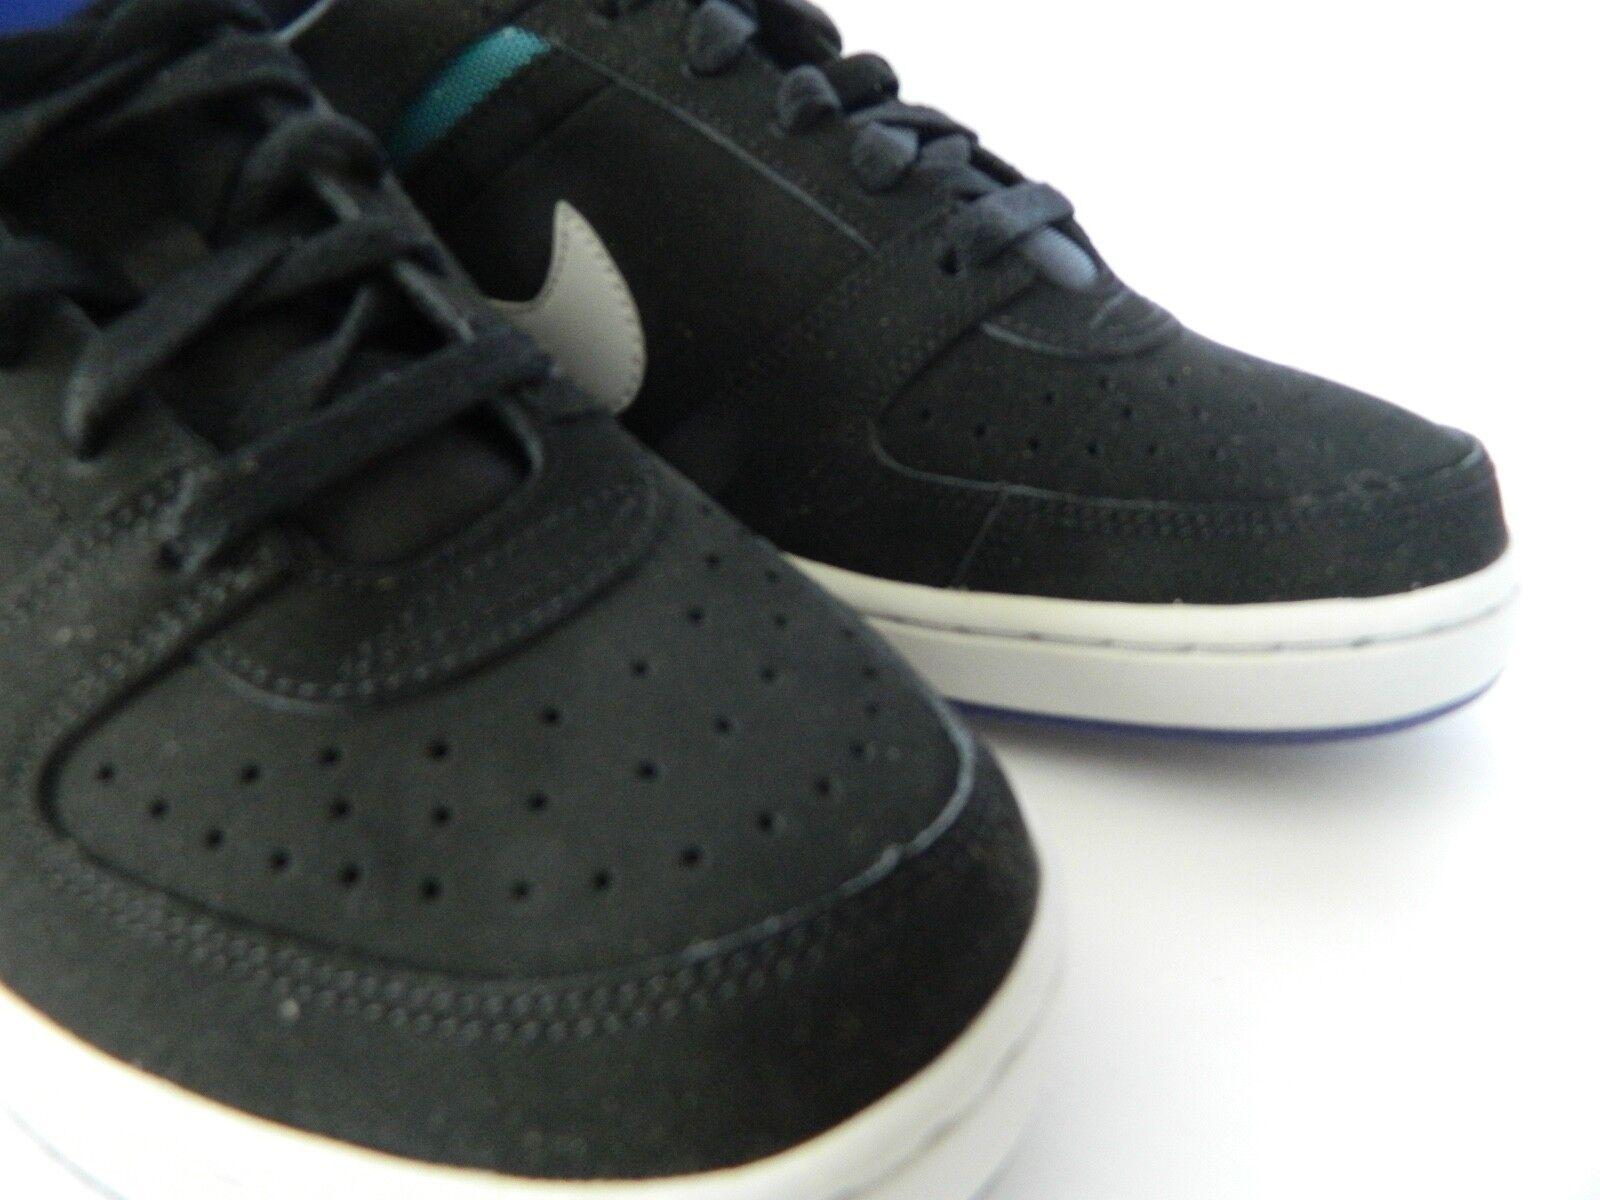 Nike Nike Nike Wmns Convention Low ( Black Ntrl Grey-Cncrd-Chlrn Bl ) ( 417418 001 ) NIB 7b26cb